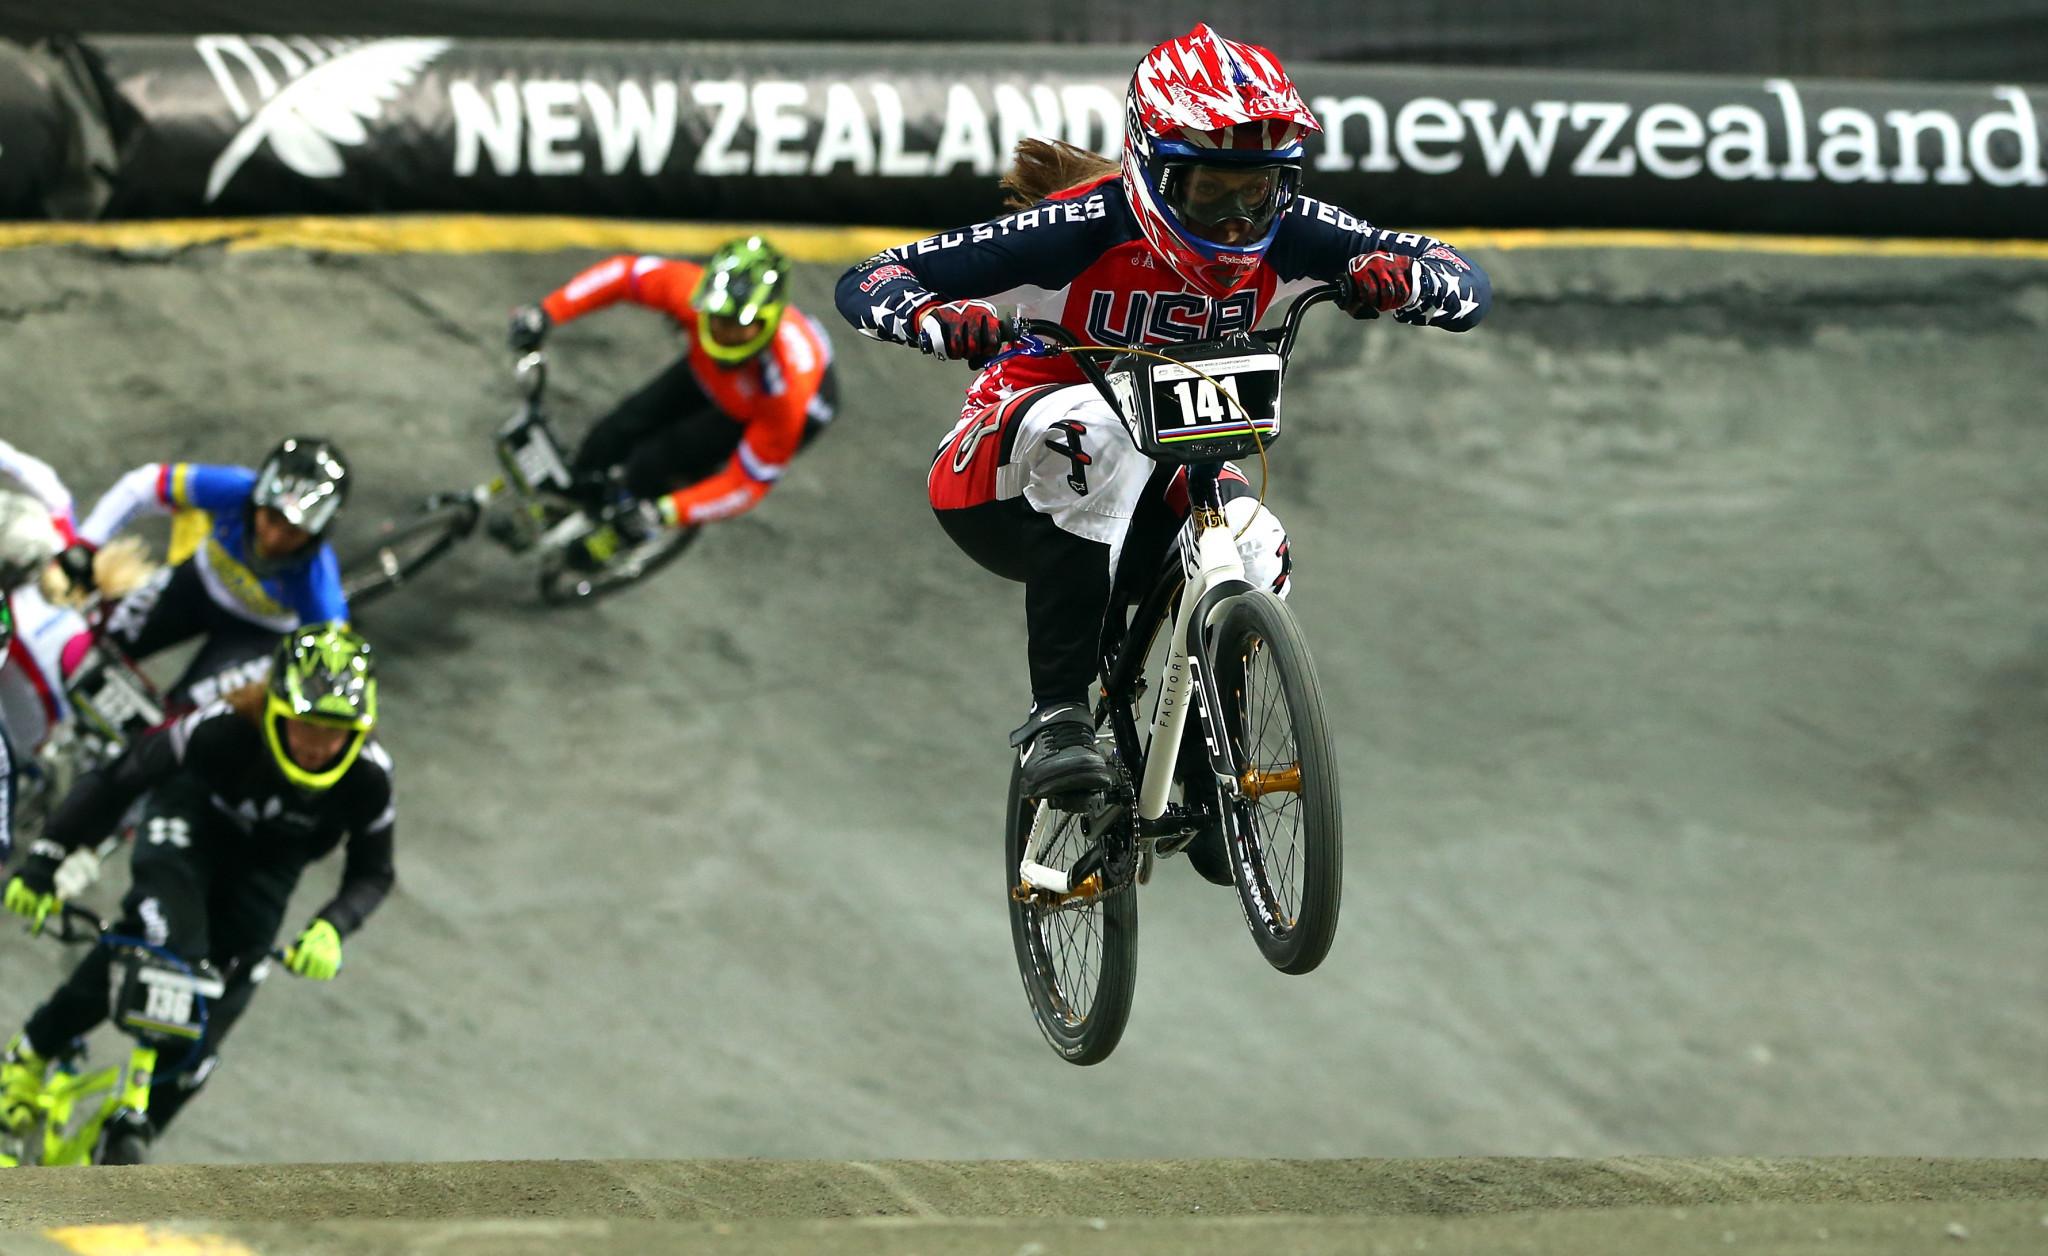 Marquart and Stancil win on first BMX Supercross World Cup leg in Sakarya